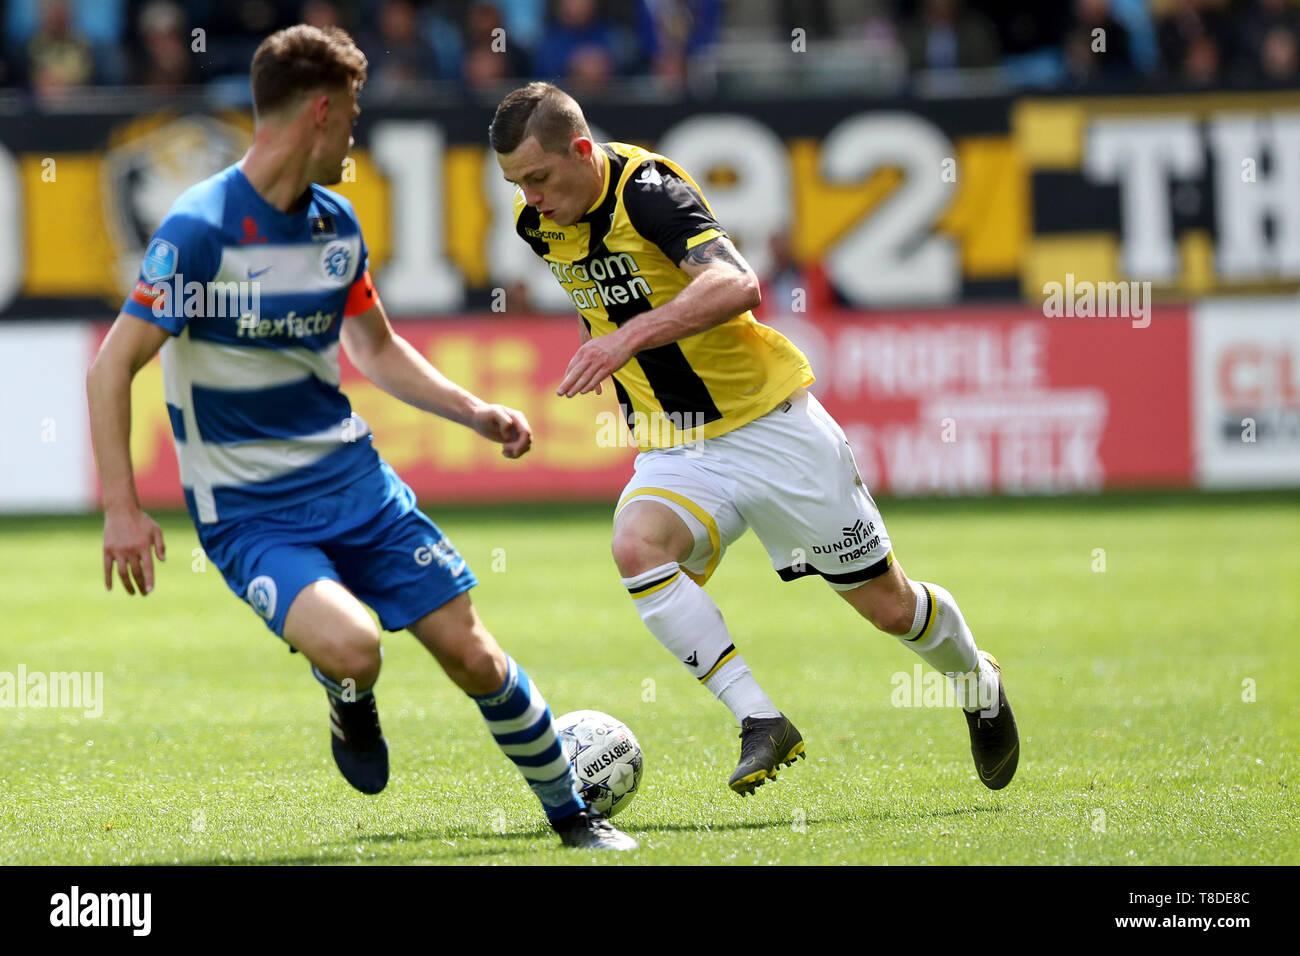 12 may 2019 Doetinchem, The Netherlands Soccer Dutch Eredivisie De Graafschap v Vitesse   L-R: Bart Straalman of de Graafschap en Thomas Buitink of Vi - Stock Image